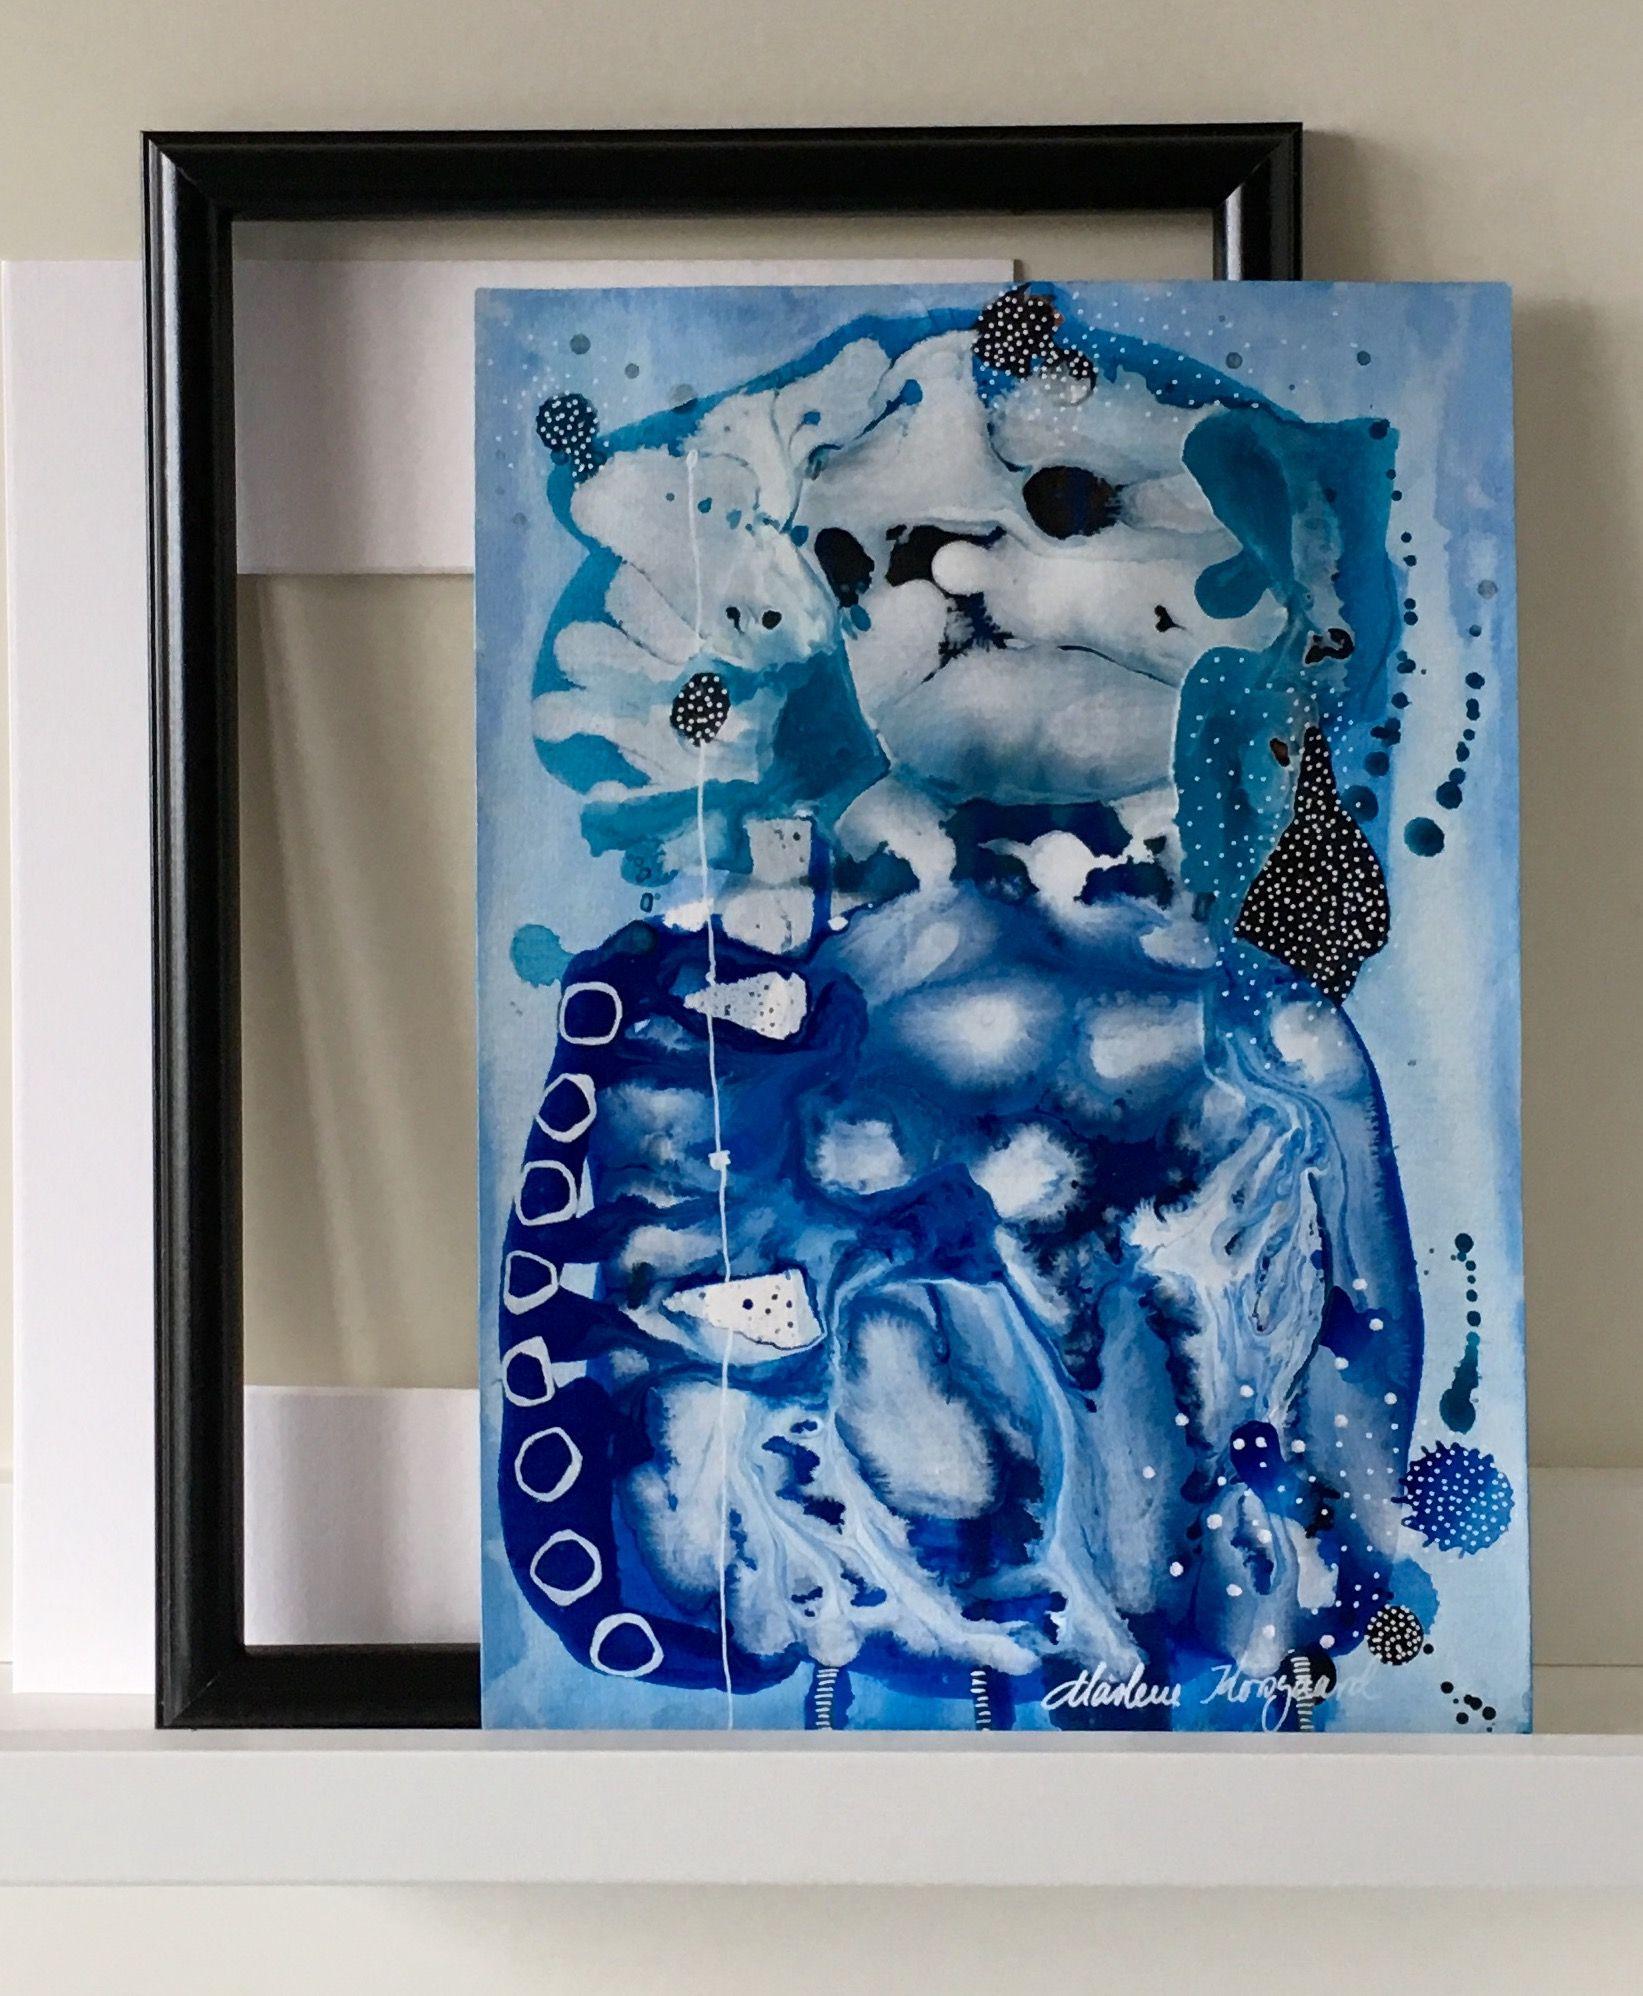 Papir Maleri A4 Indrammes Efter Din Smag Www Gallerimarlene Com Abstract Abstract Art Art